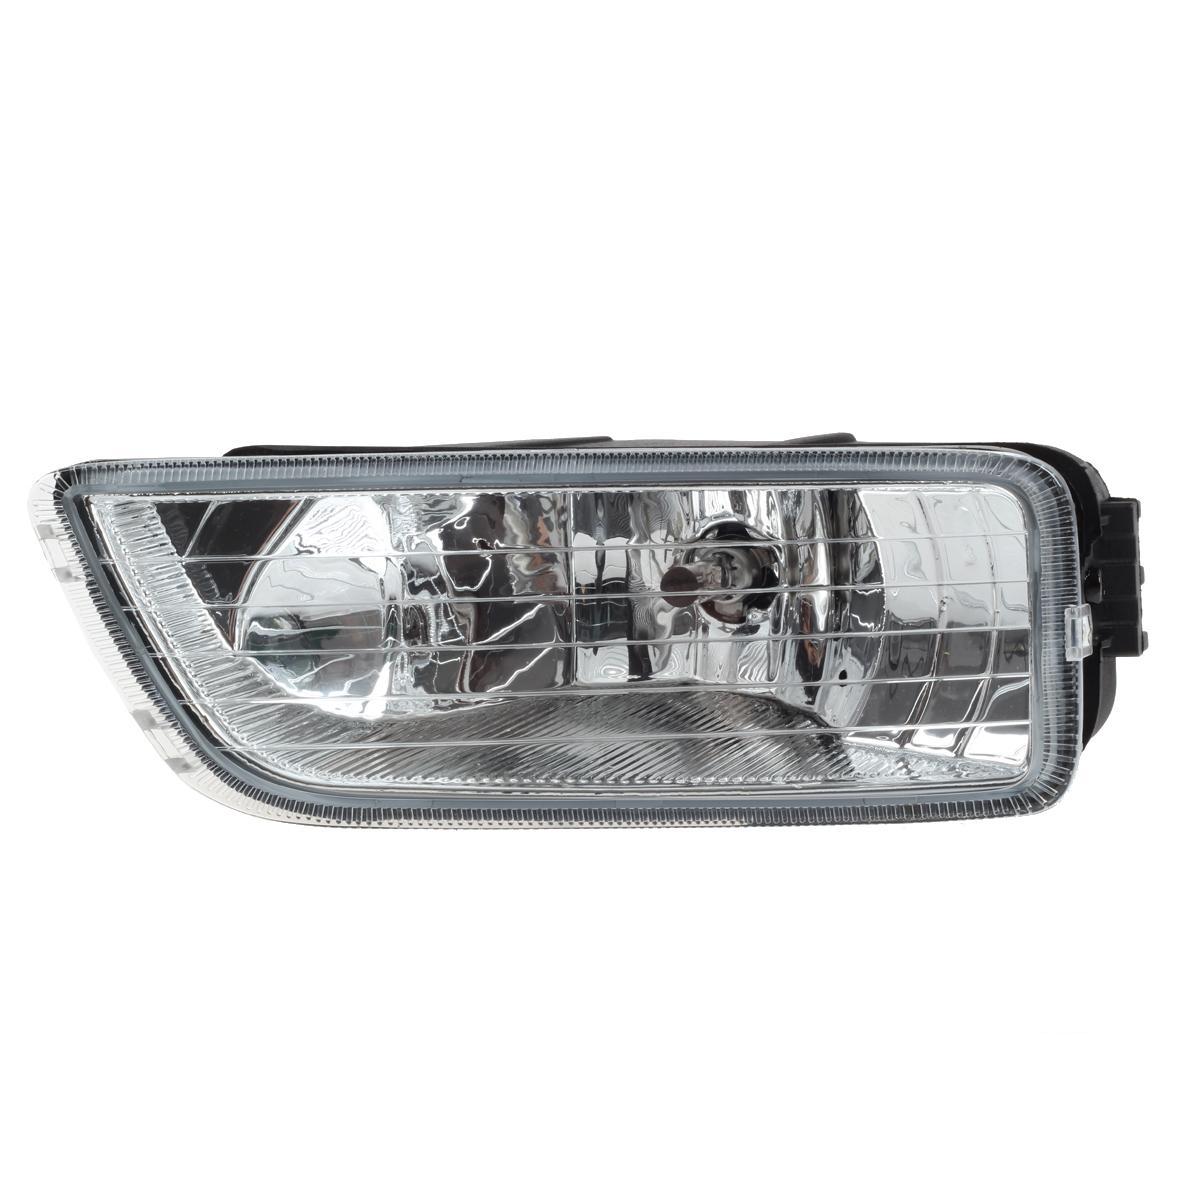 New Fog Light For Acura Tl 2004  Honda Accord 2003